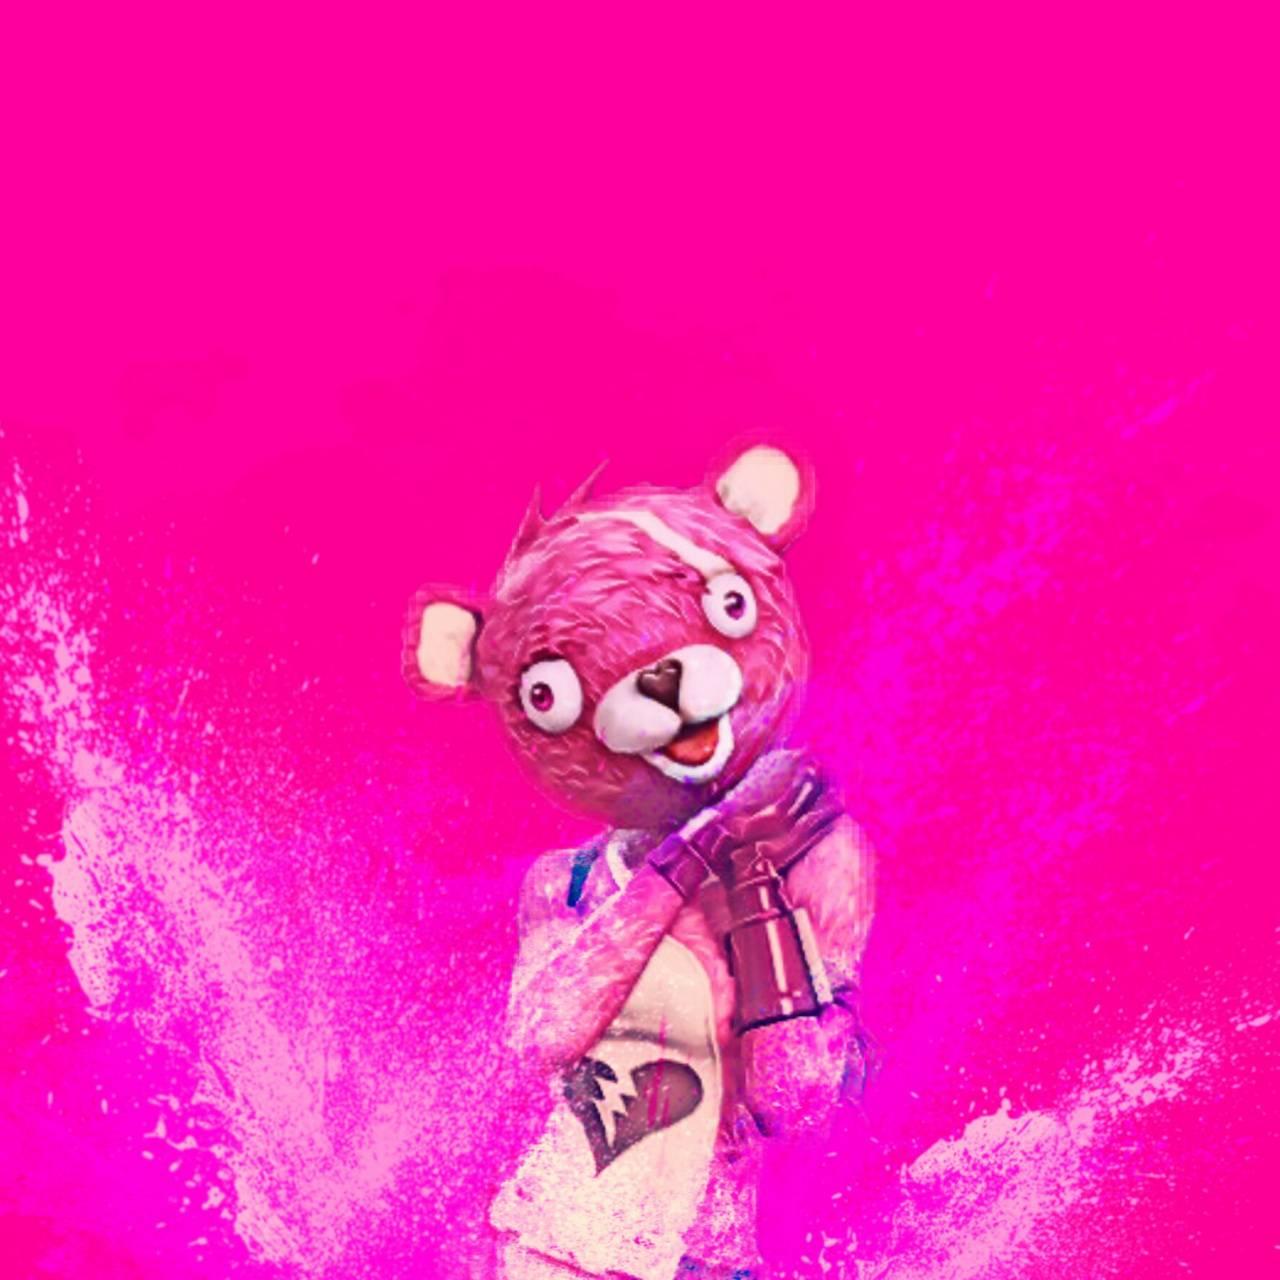 Love Bear Wallpaper By Tkingwallpapers B3 Free On Zedge